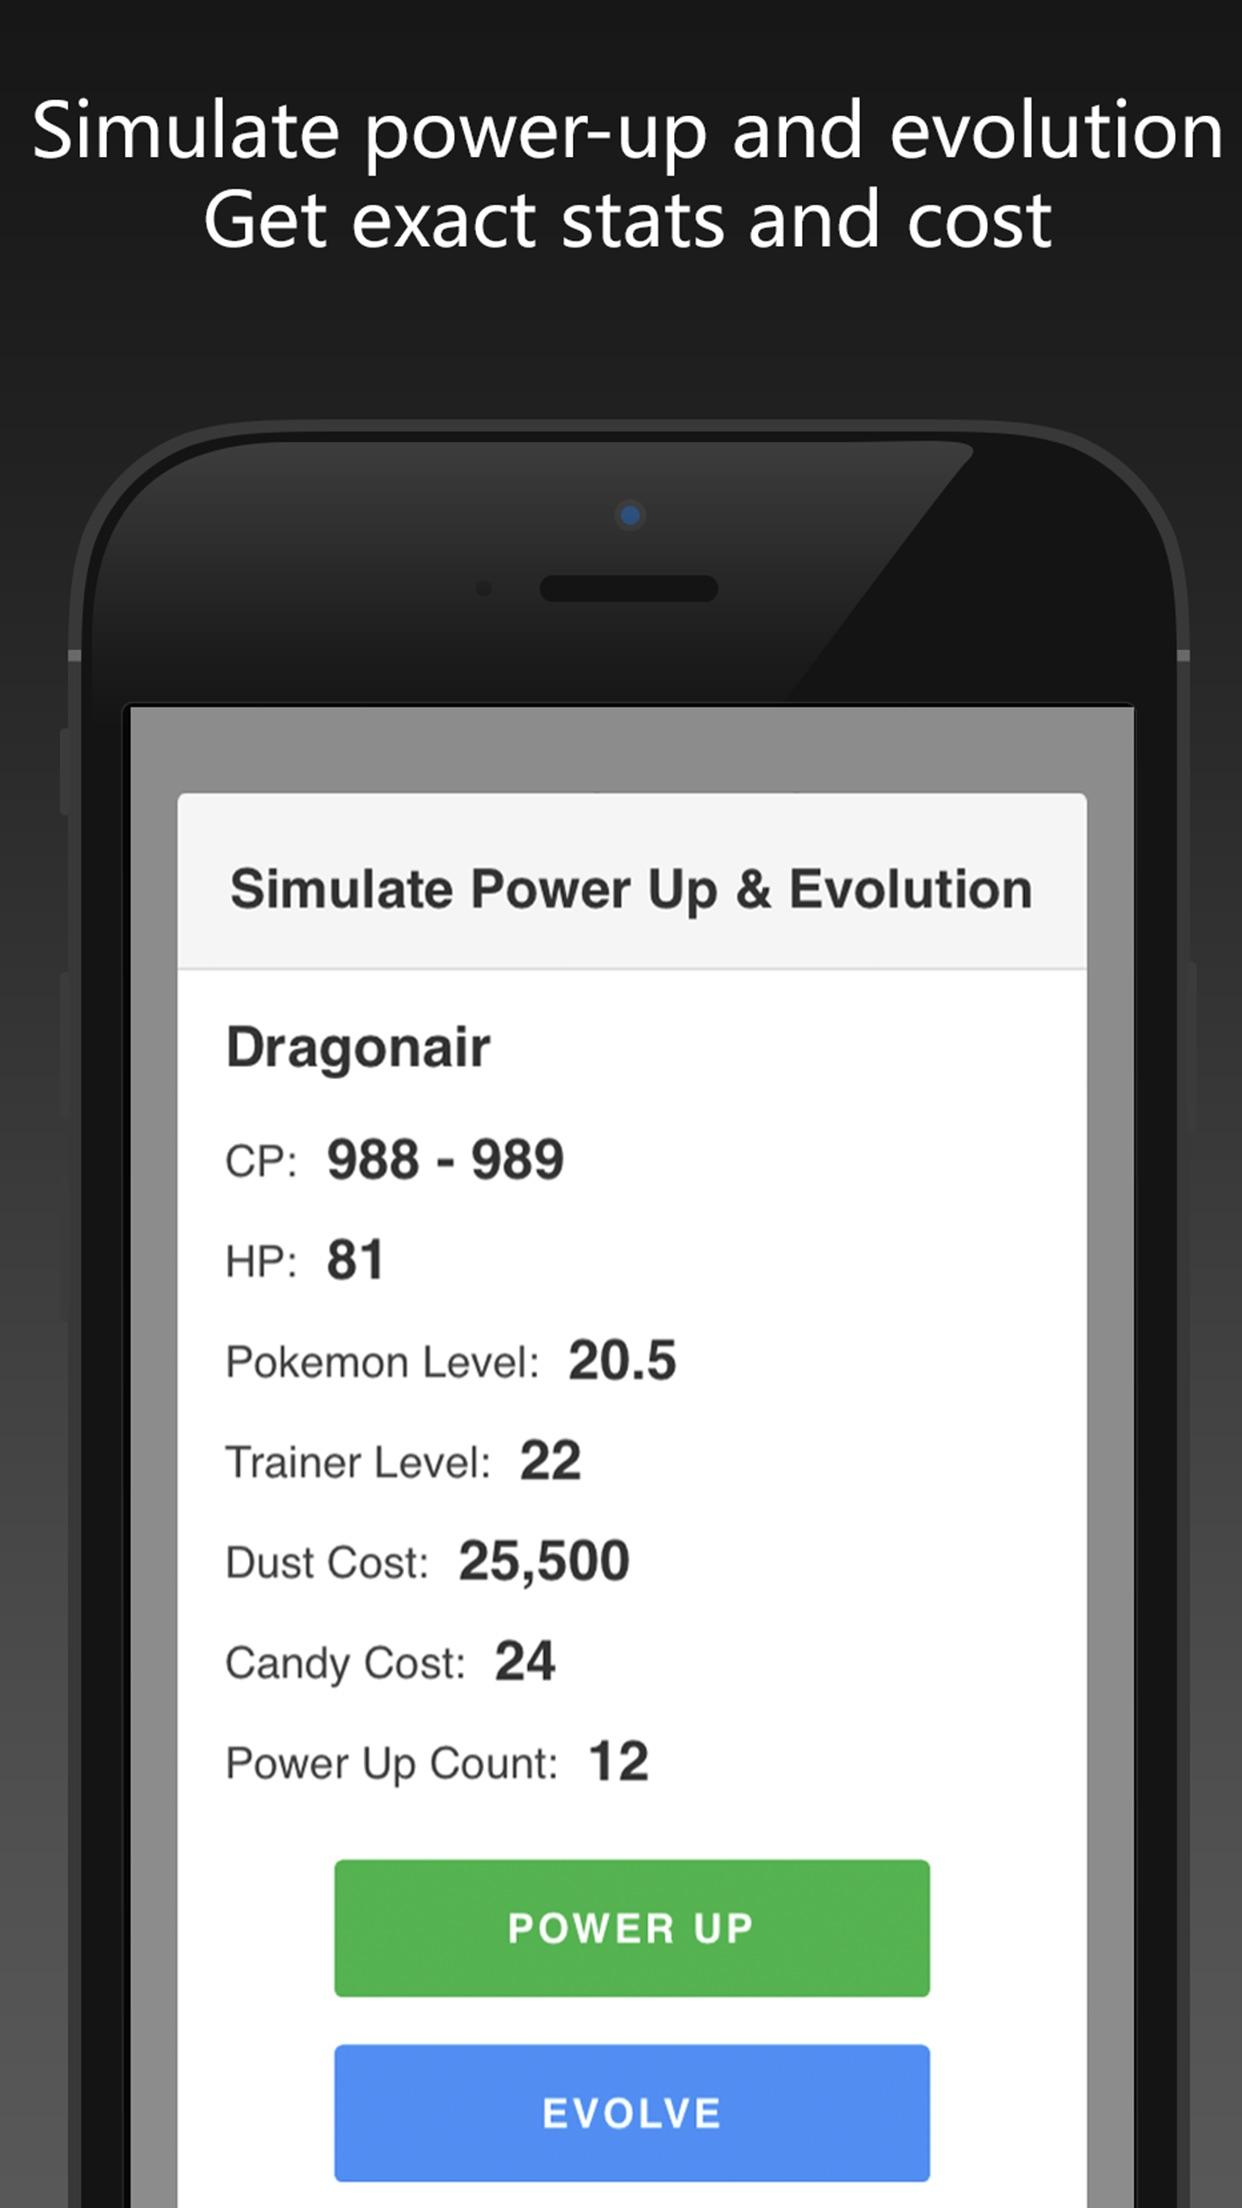 poke genie for pokemon go auto iv calculator by can jin. Black Bedroom Furniture Sets. Home Design Ideas